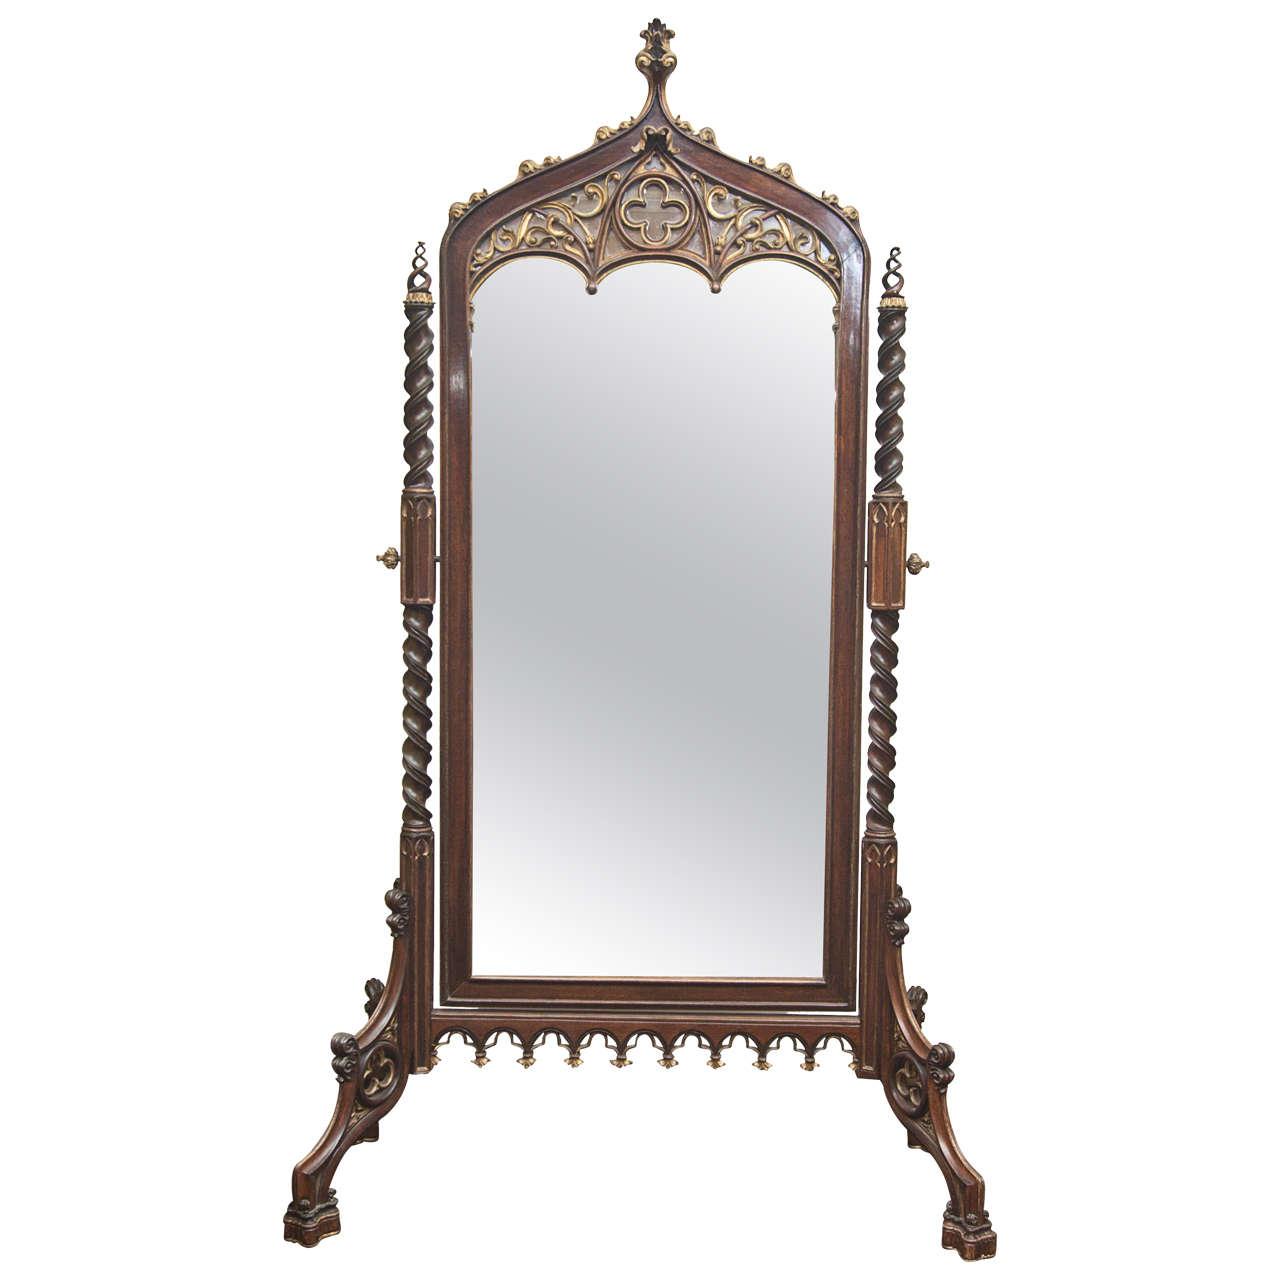 Red floor length mirror - Szerzodesek